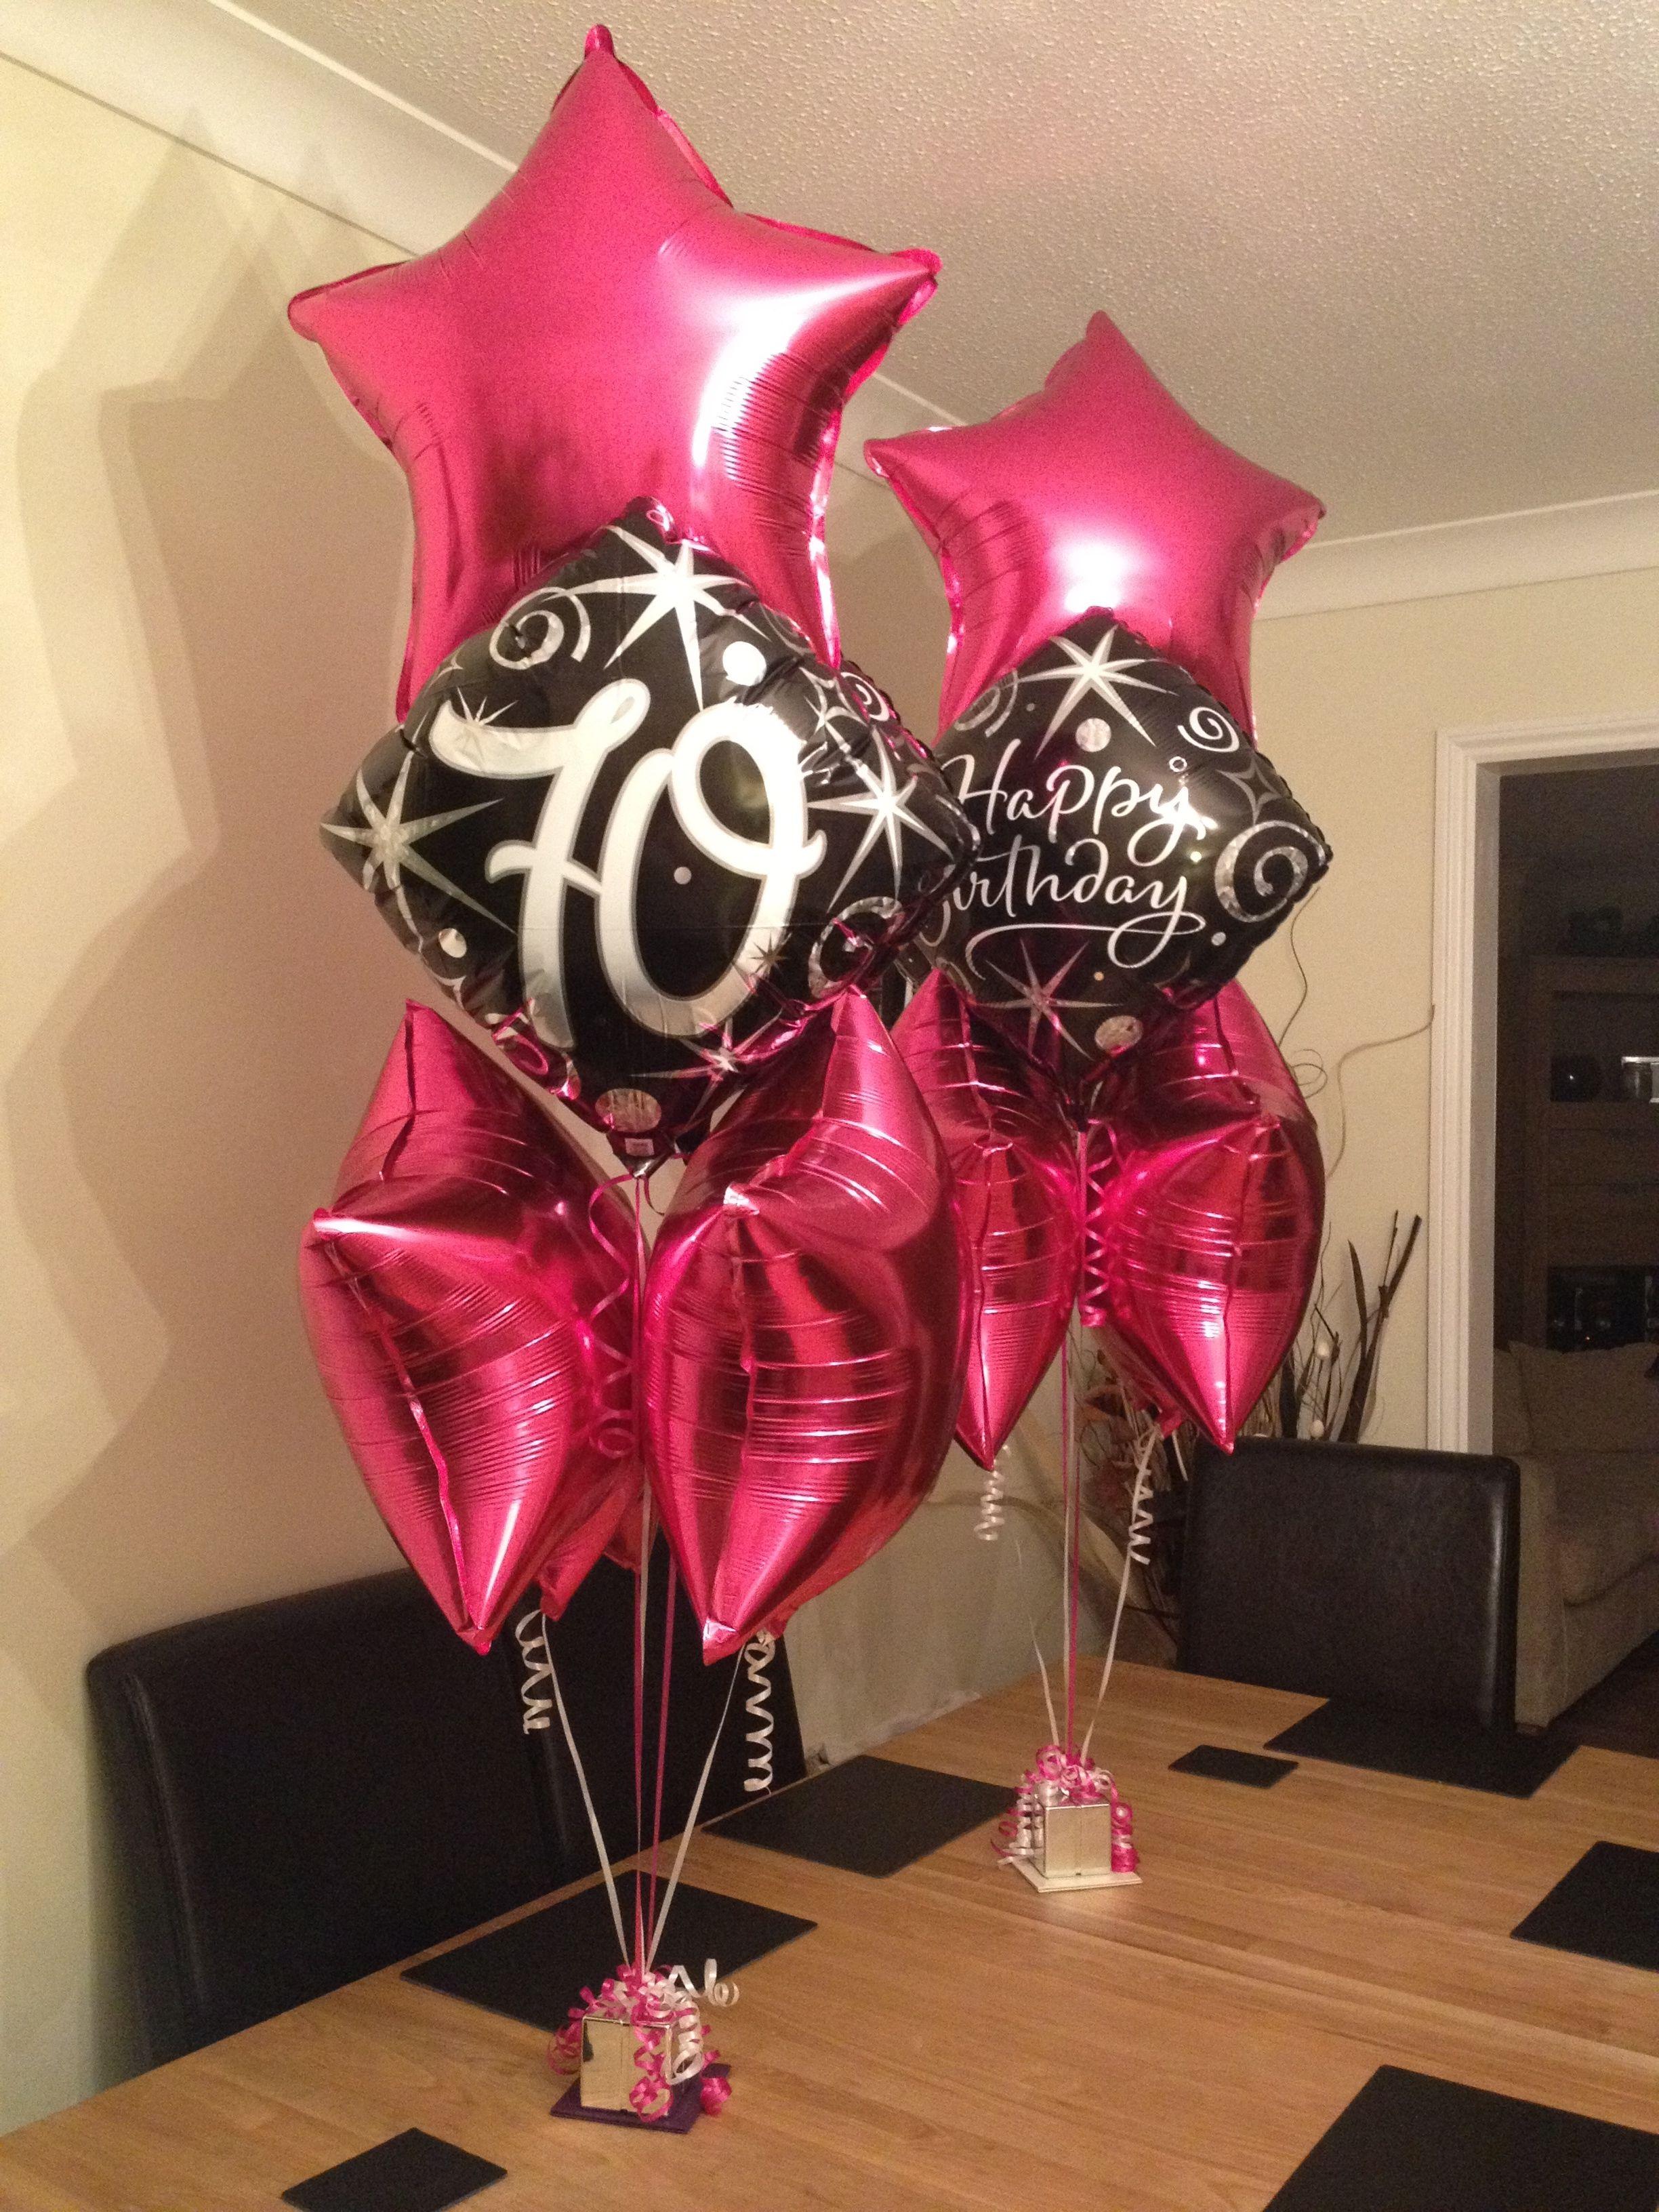 Happy birthday balloon bouquets 70th magenta stars and for Balloon arrangement ideas